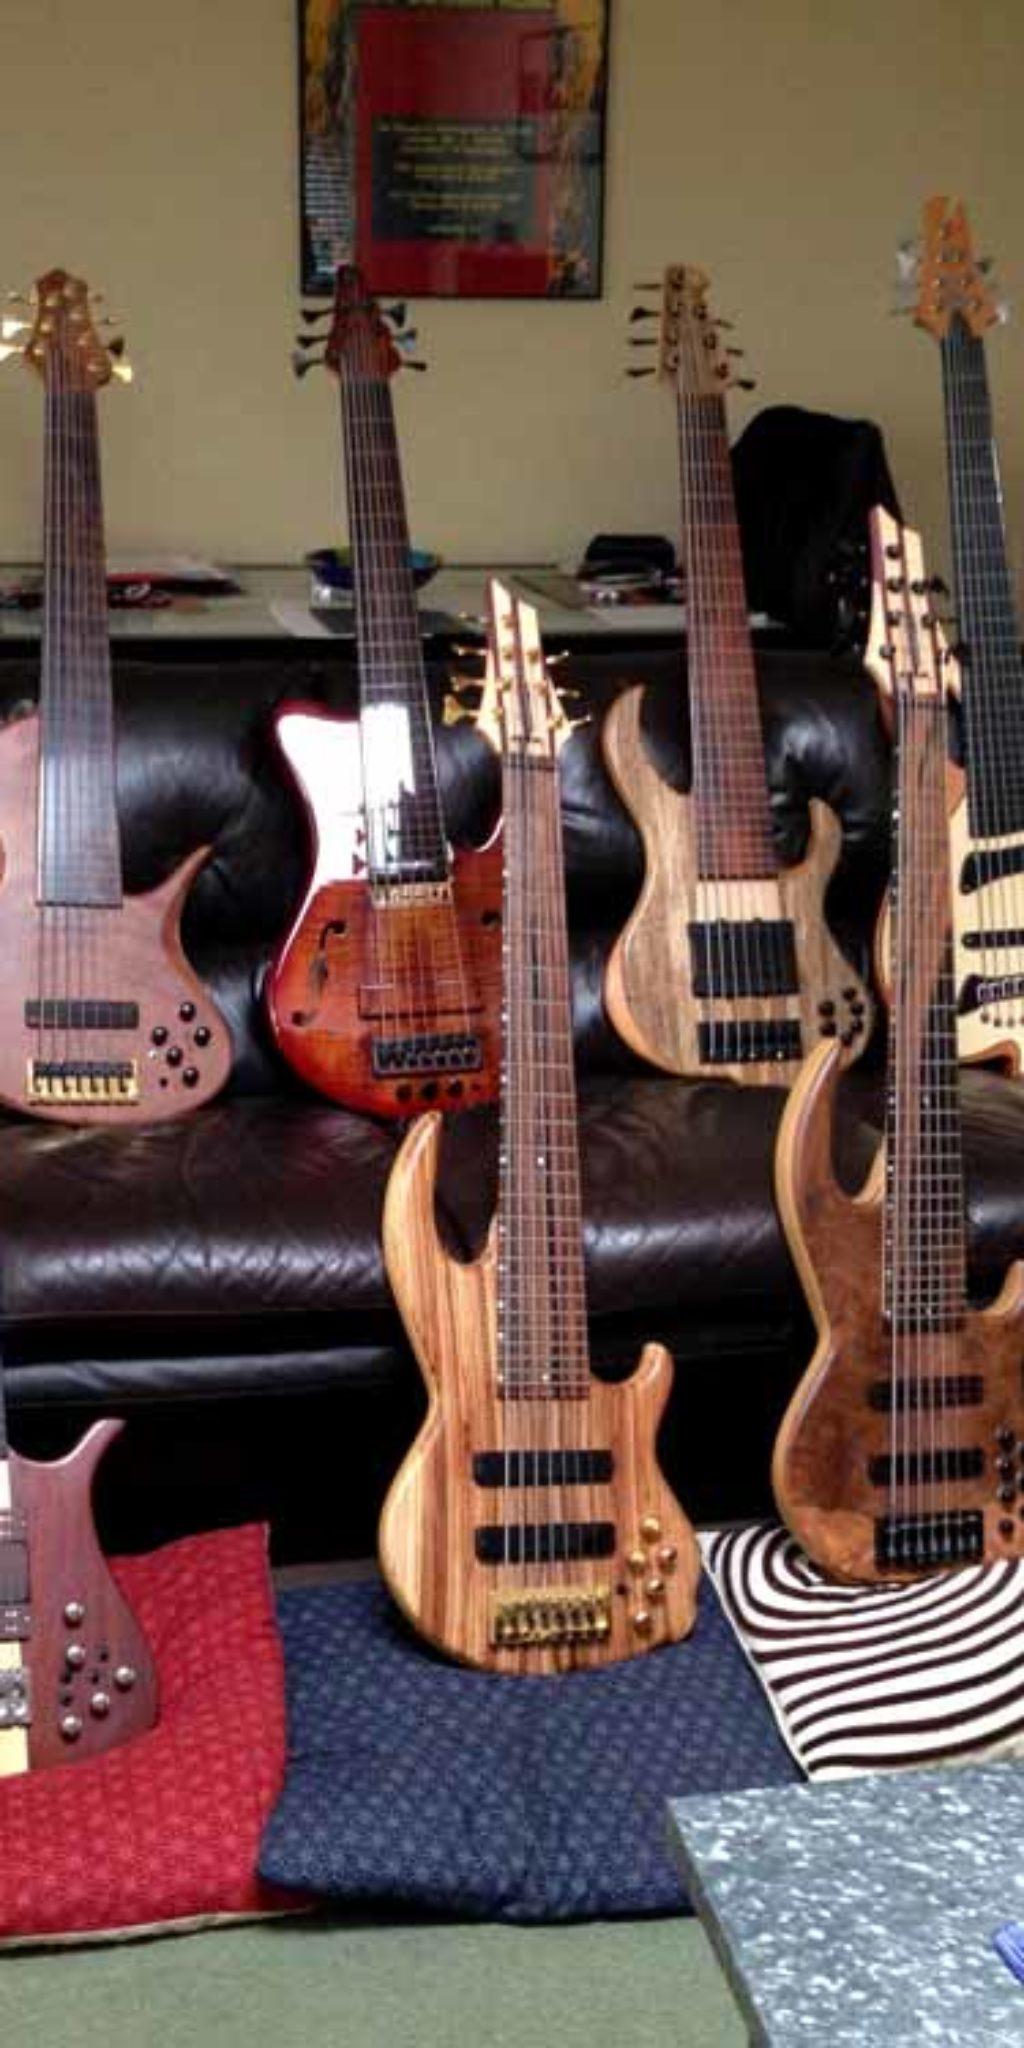 The basses of Edo